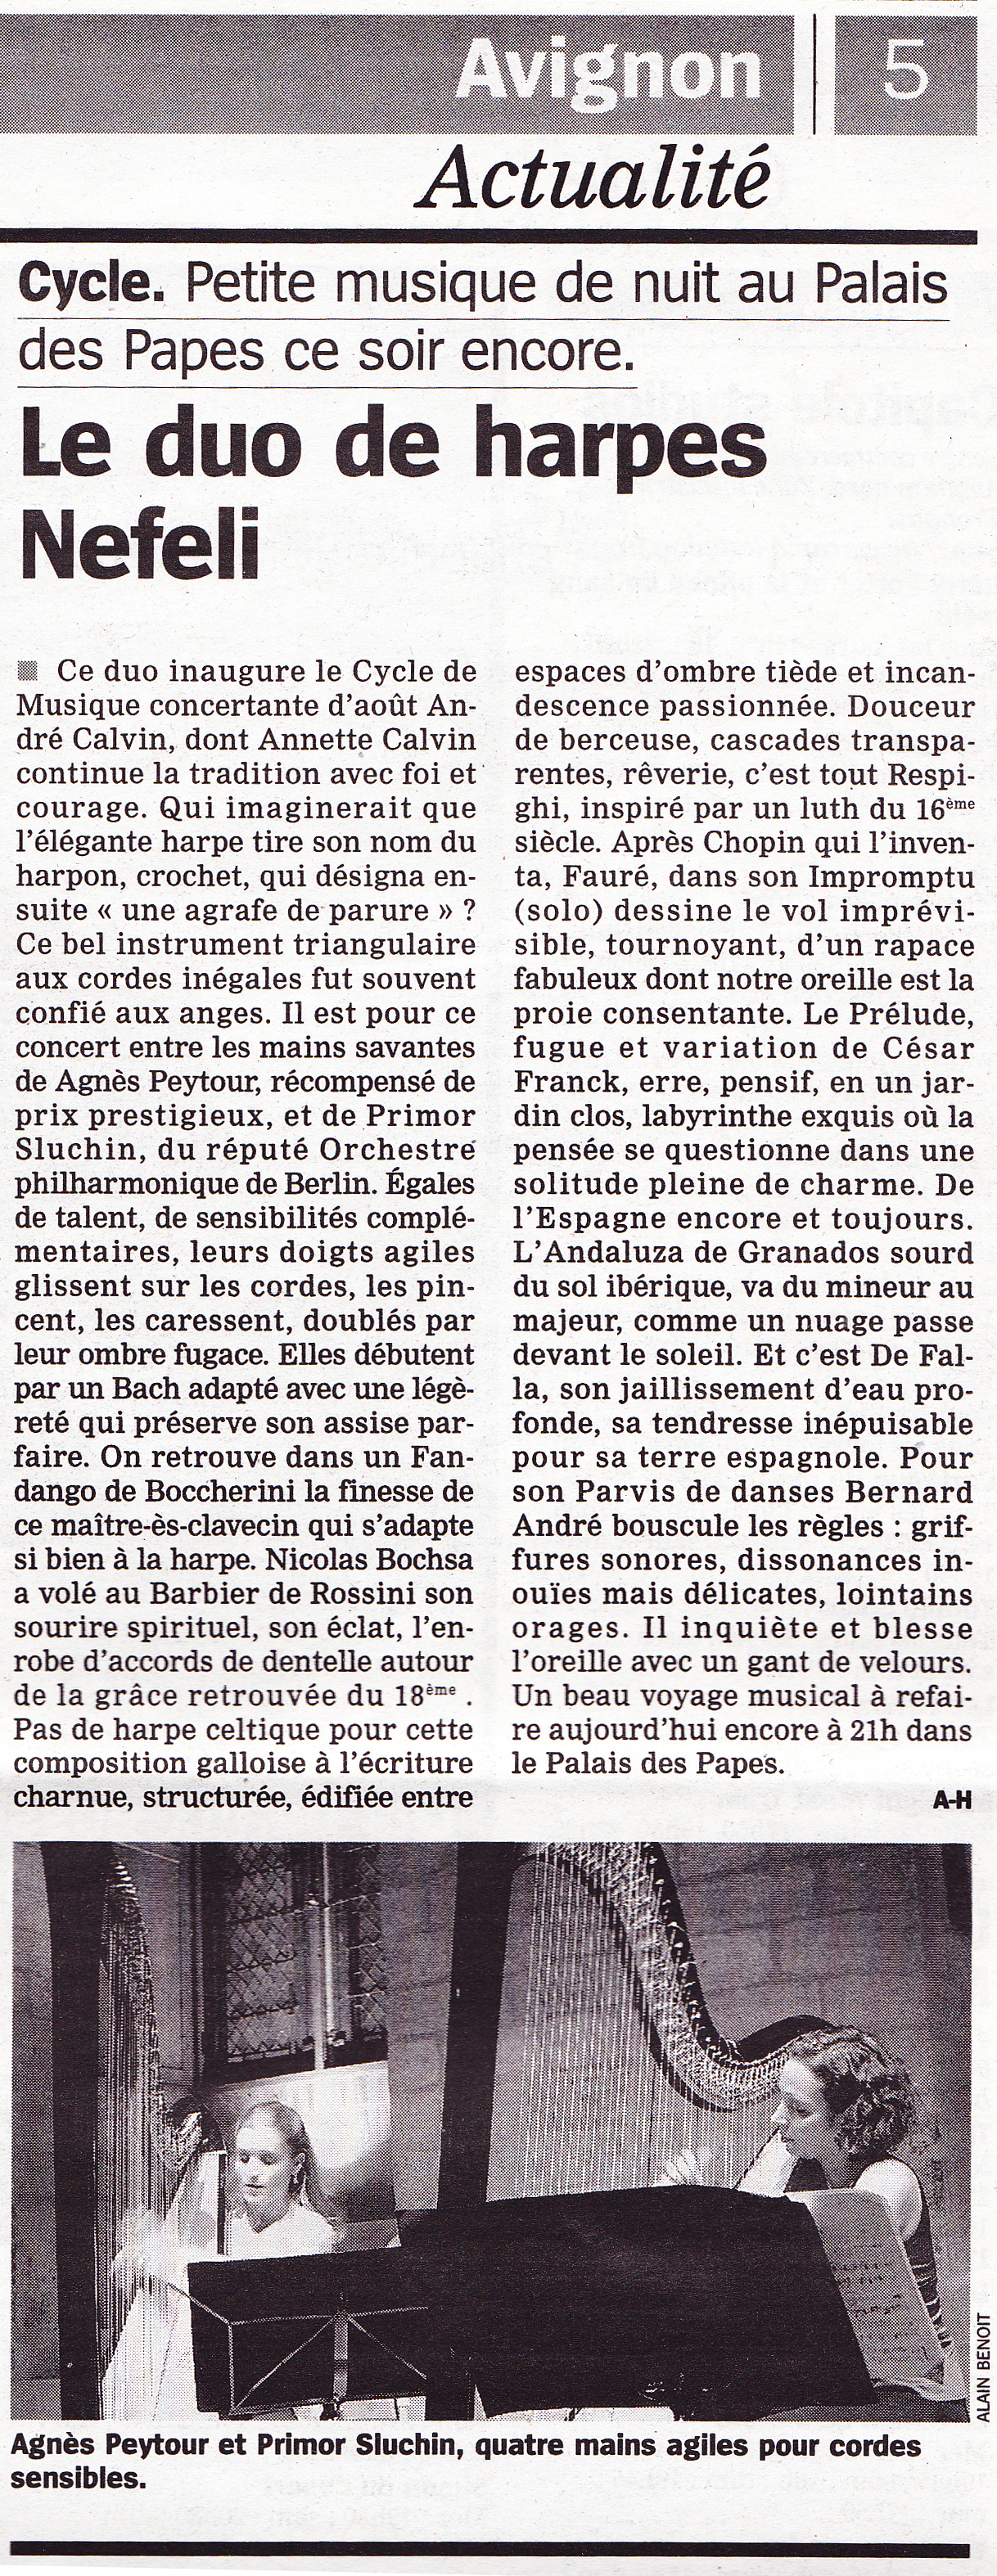 Duo de harpes Nefeli – Avignon